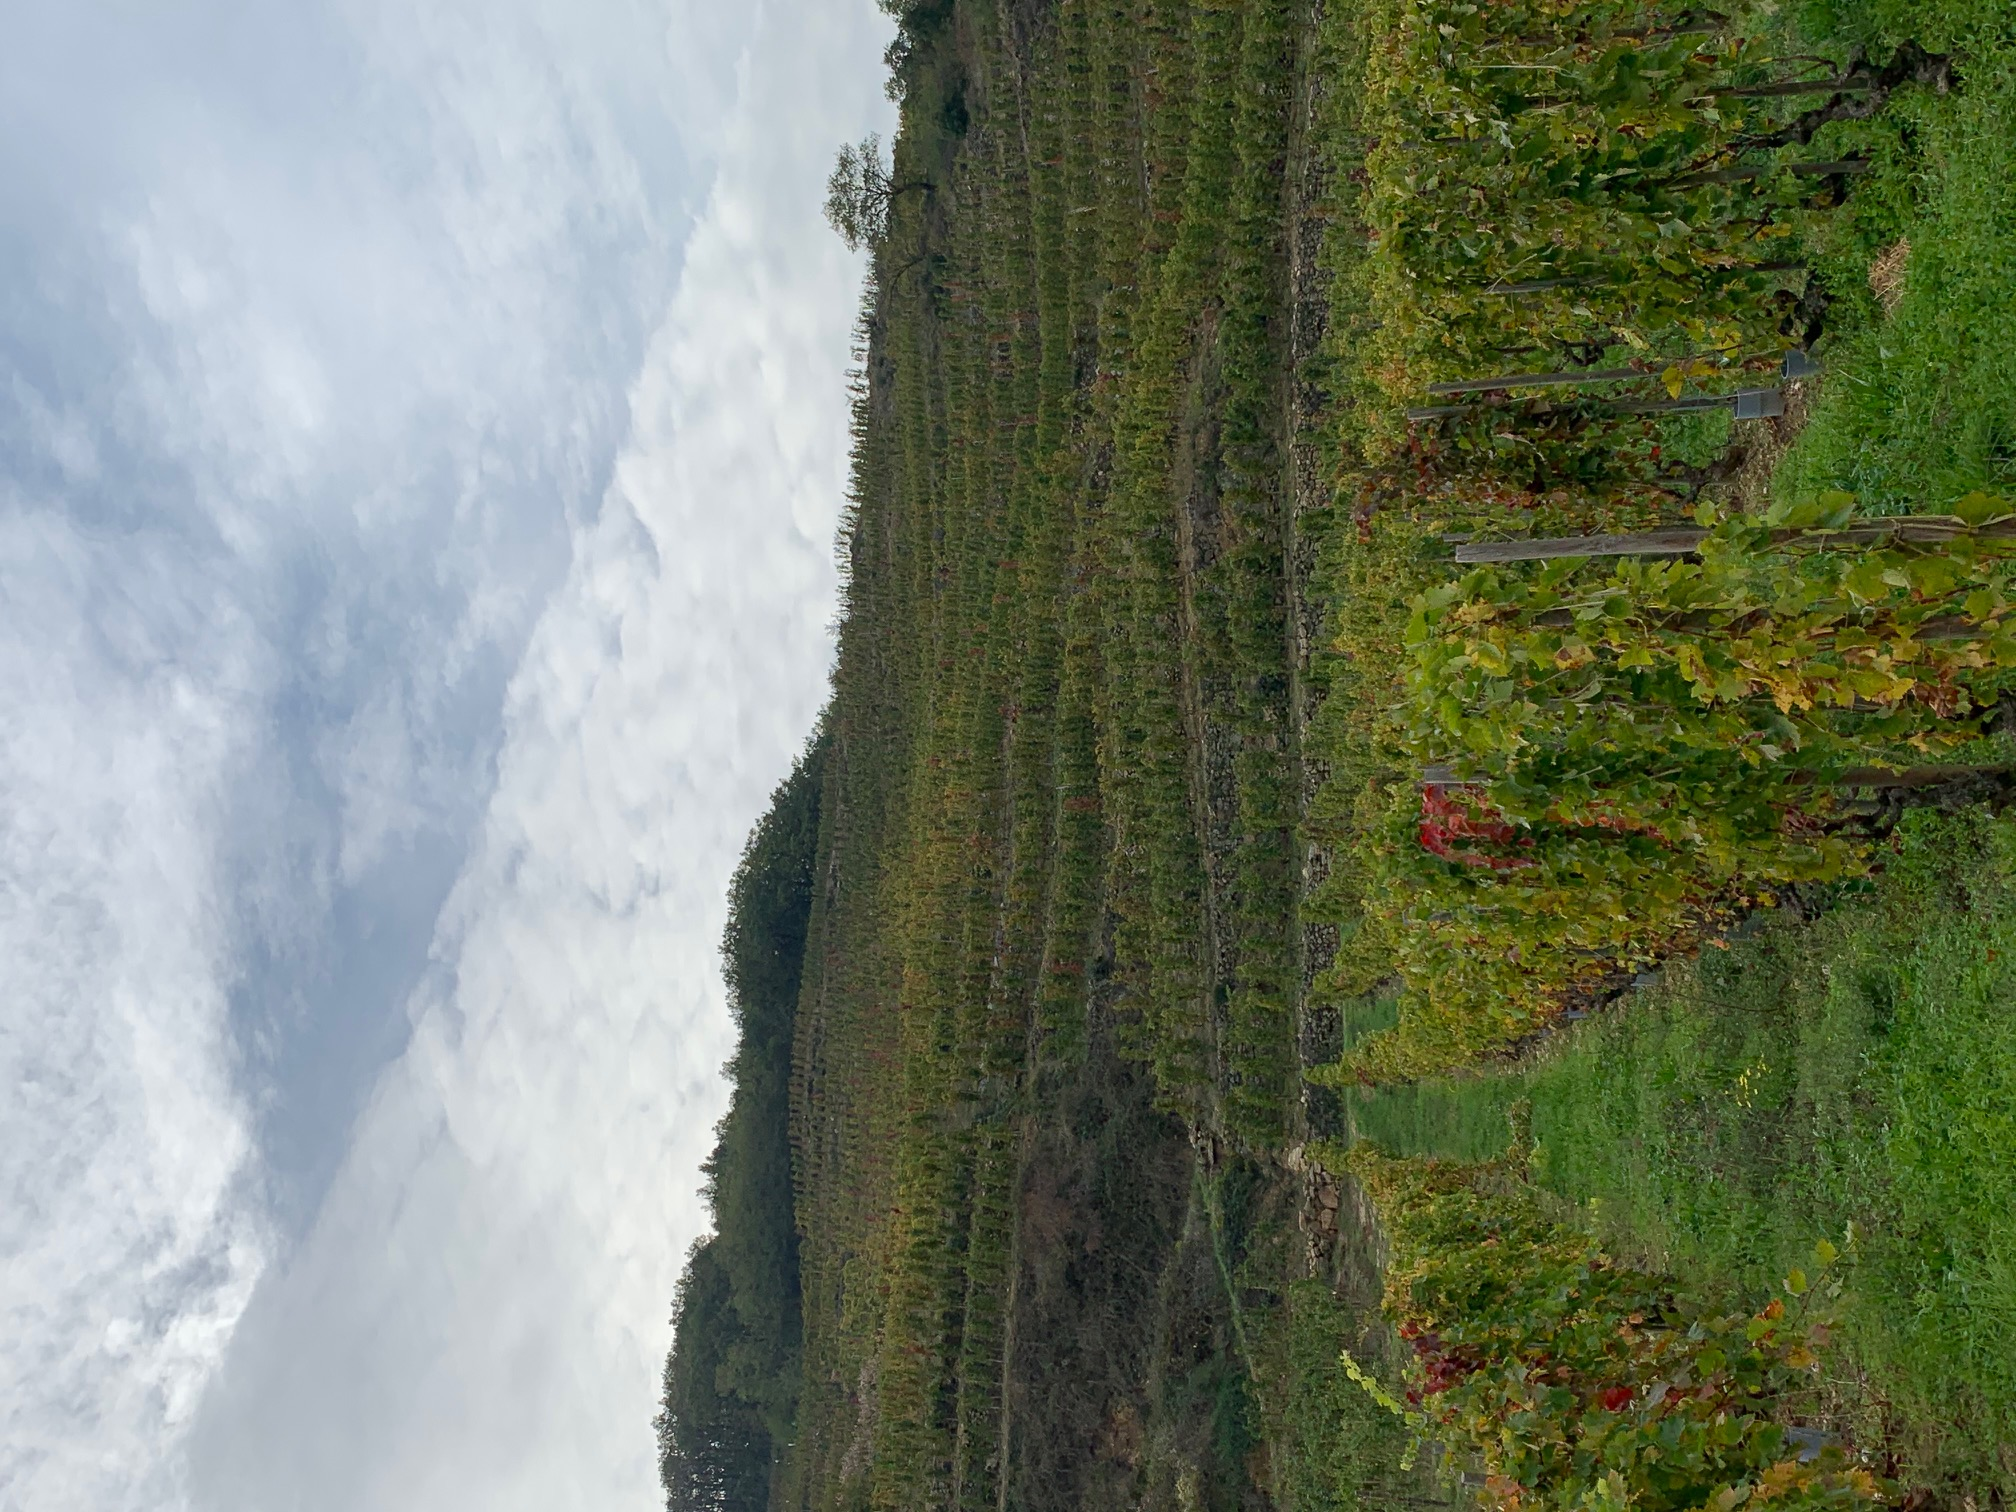 Domaine Jolivet Vineyards